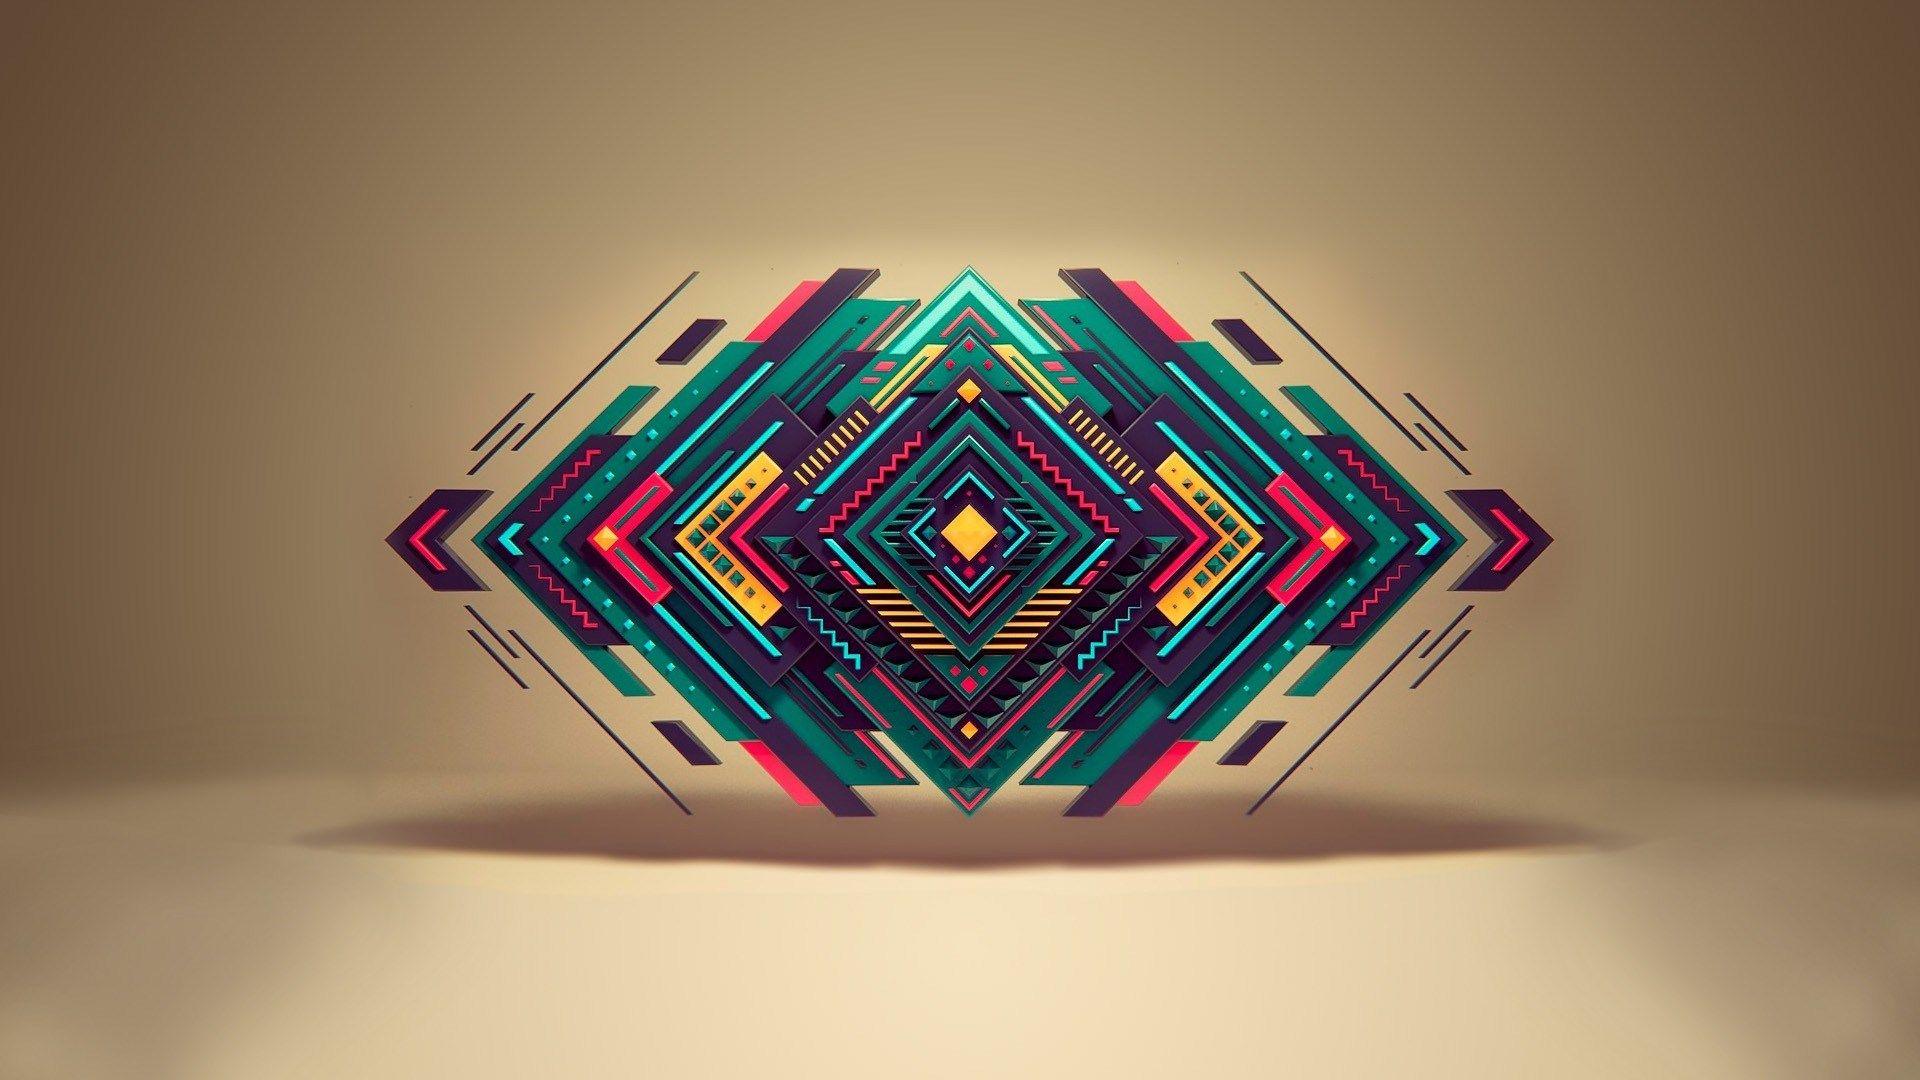 Abstract Shapes Geometry Hd Wallpaper Freehdwall Net High Definition Wallpapers For Your Desktop Fond D Ecran Abstrait Geometrie Abstrait